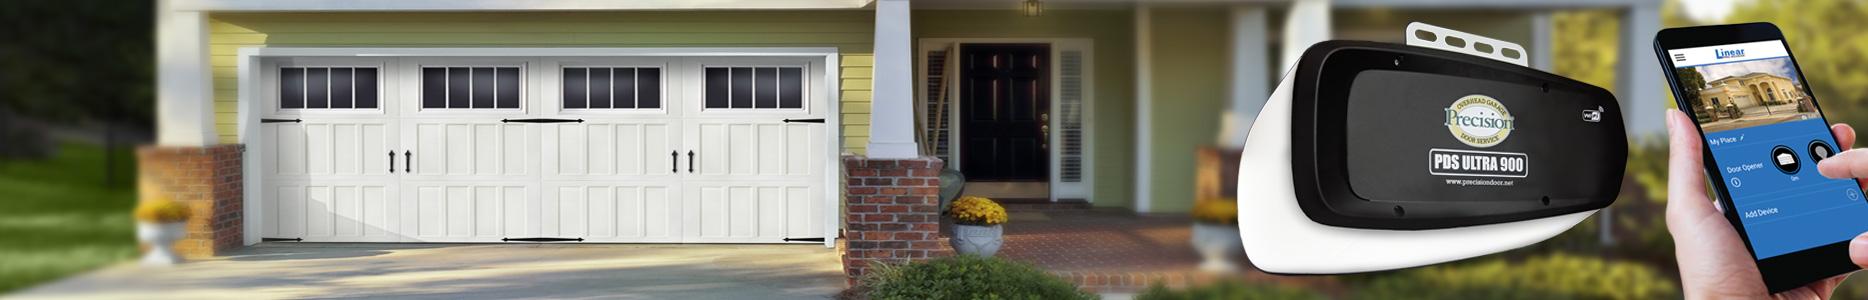 Precision Garage Door Service Openers Central Pa Garage